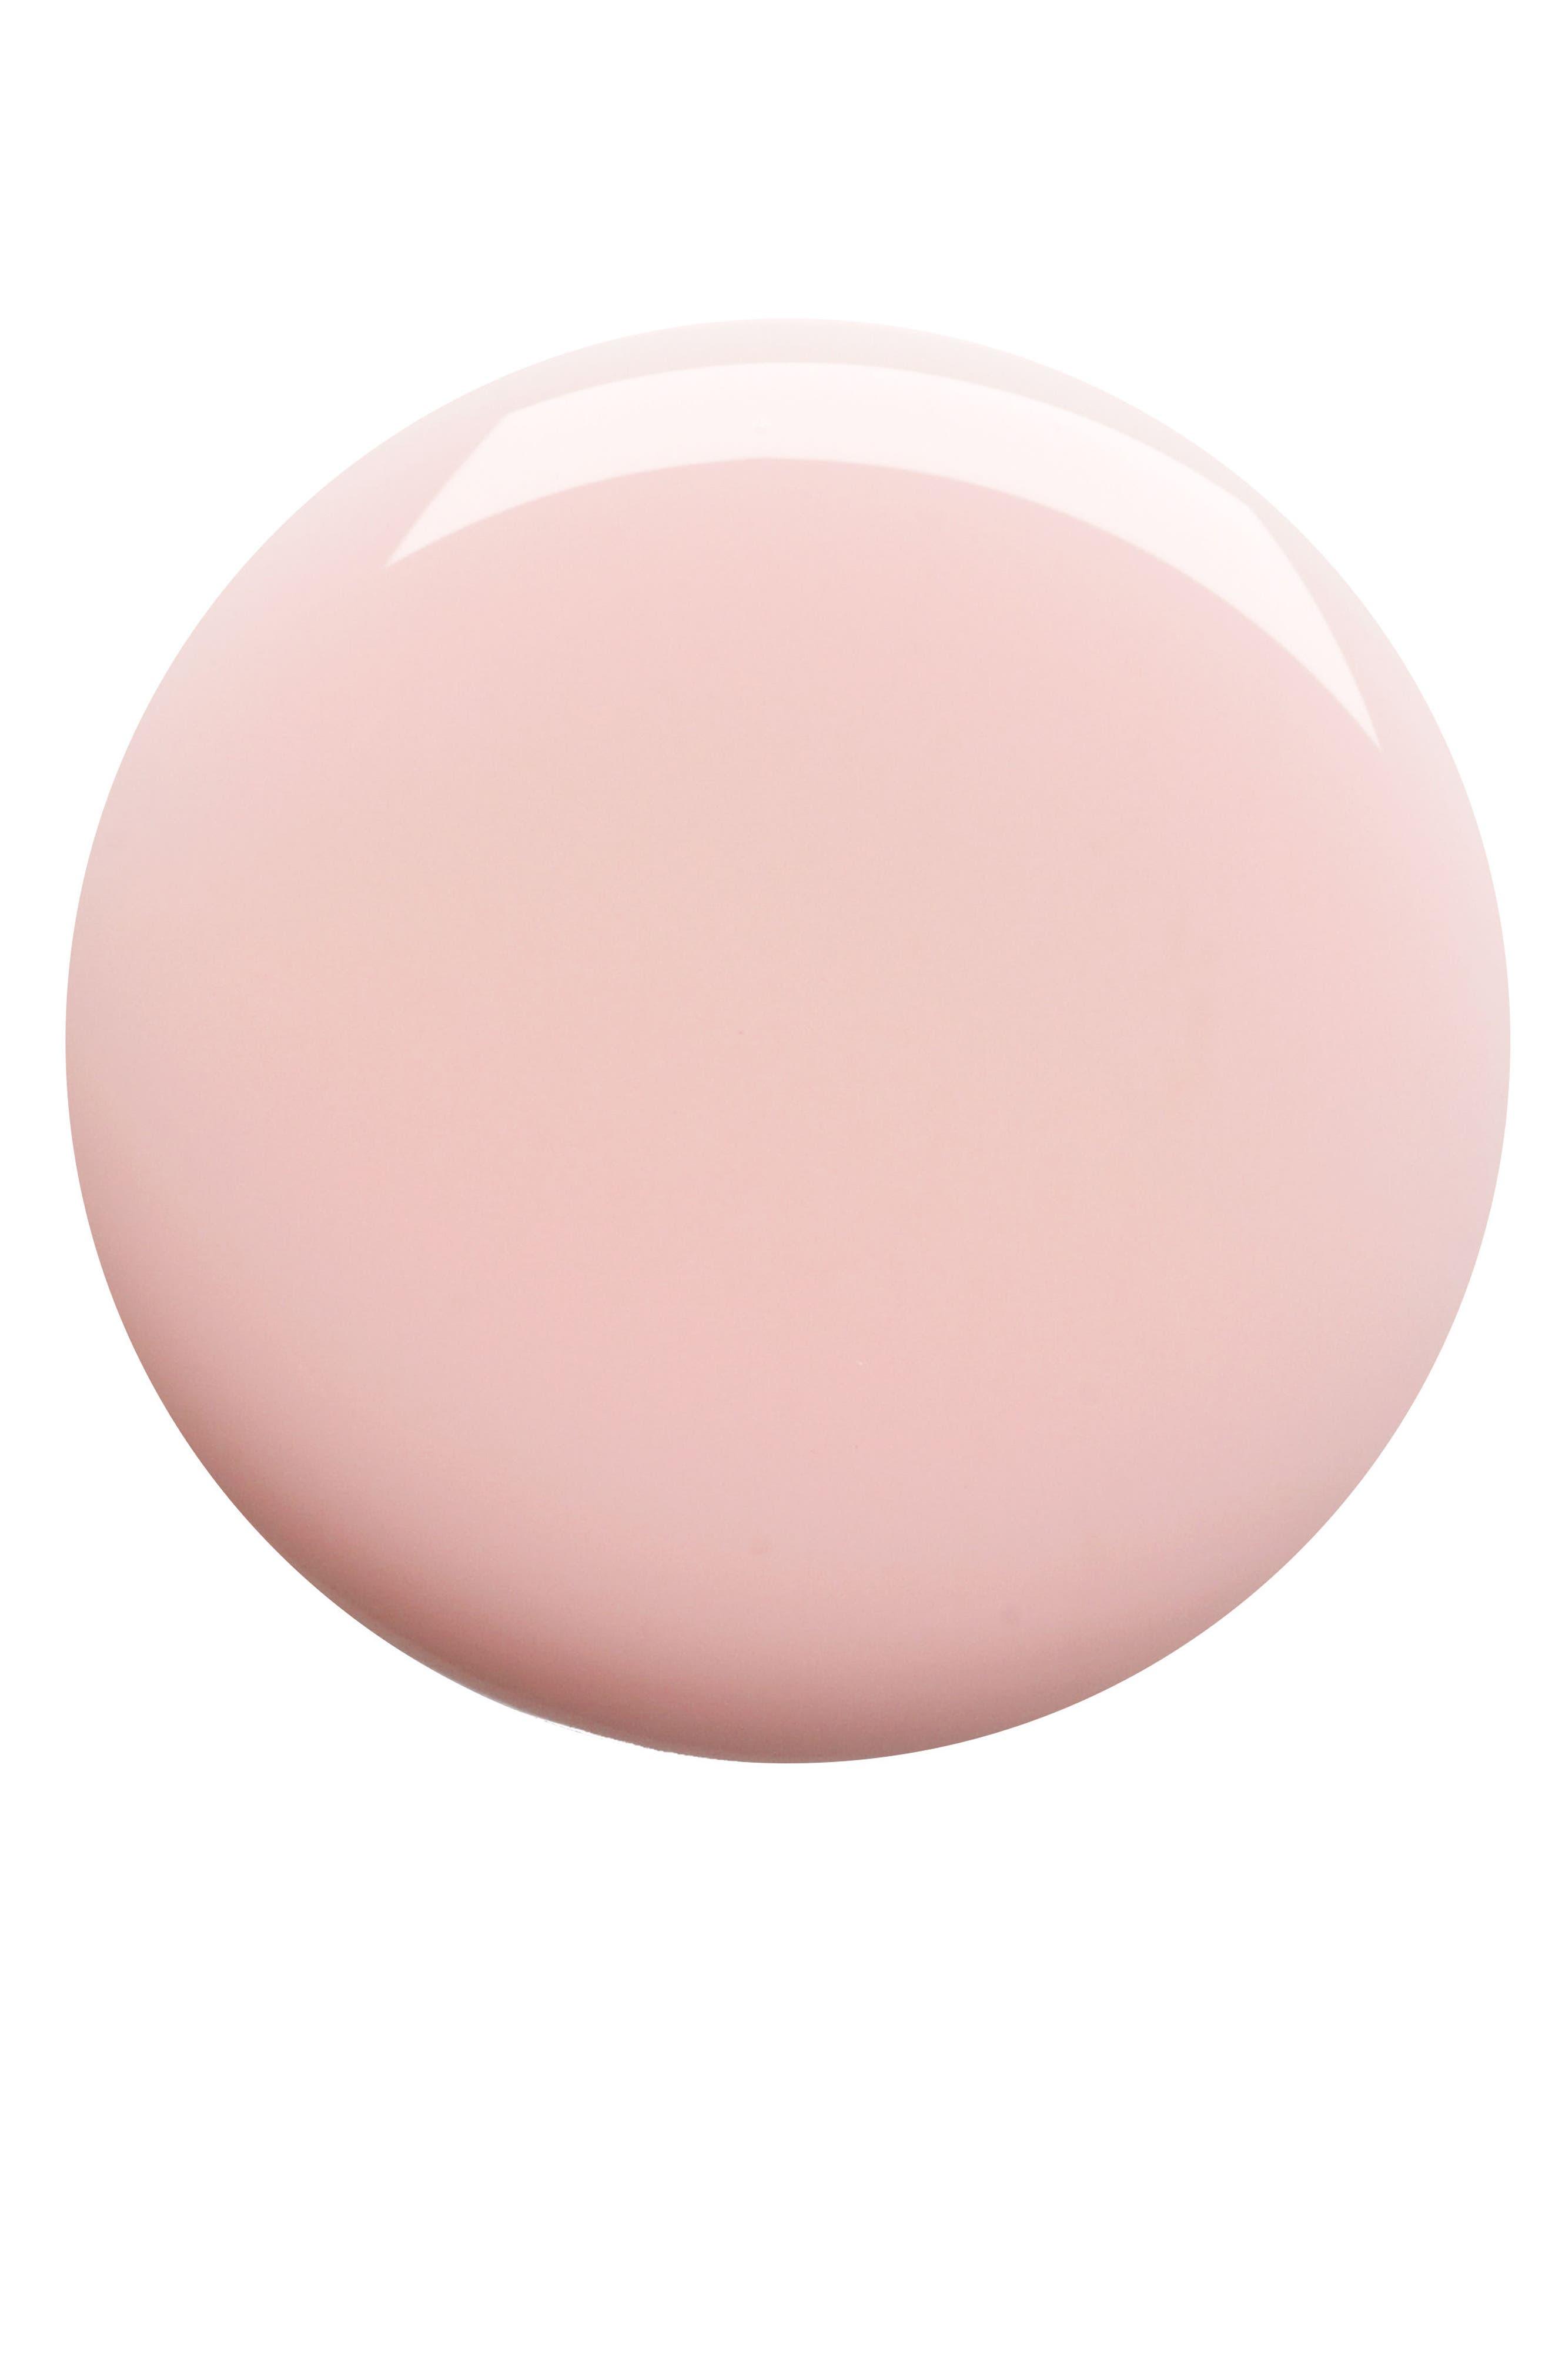 Julep<sup>™</sup> Oxygen Nail Treatment,                             Alternate thumbnail 2, color,                             NONE